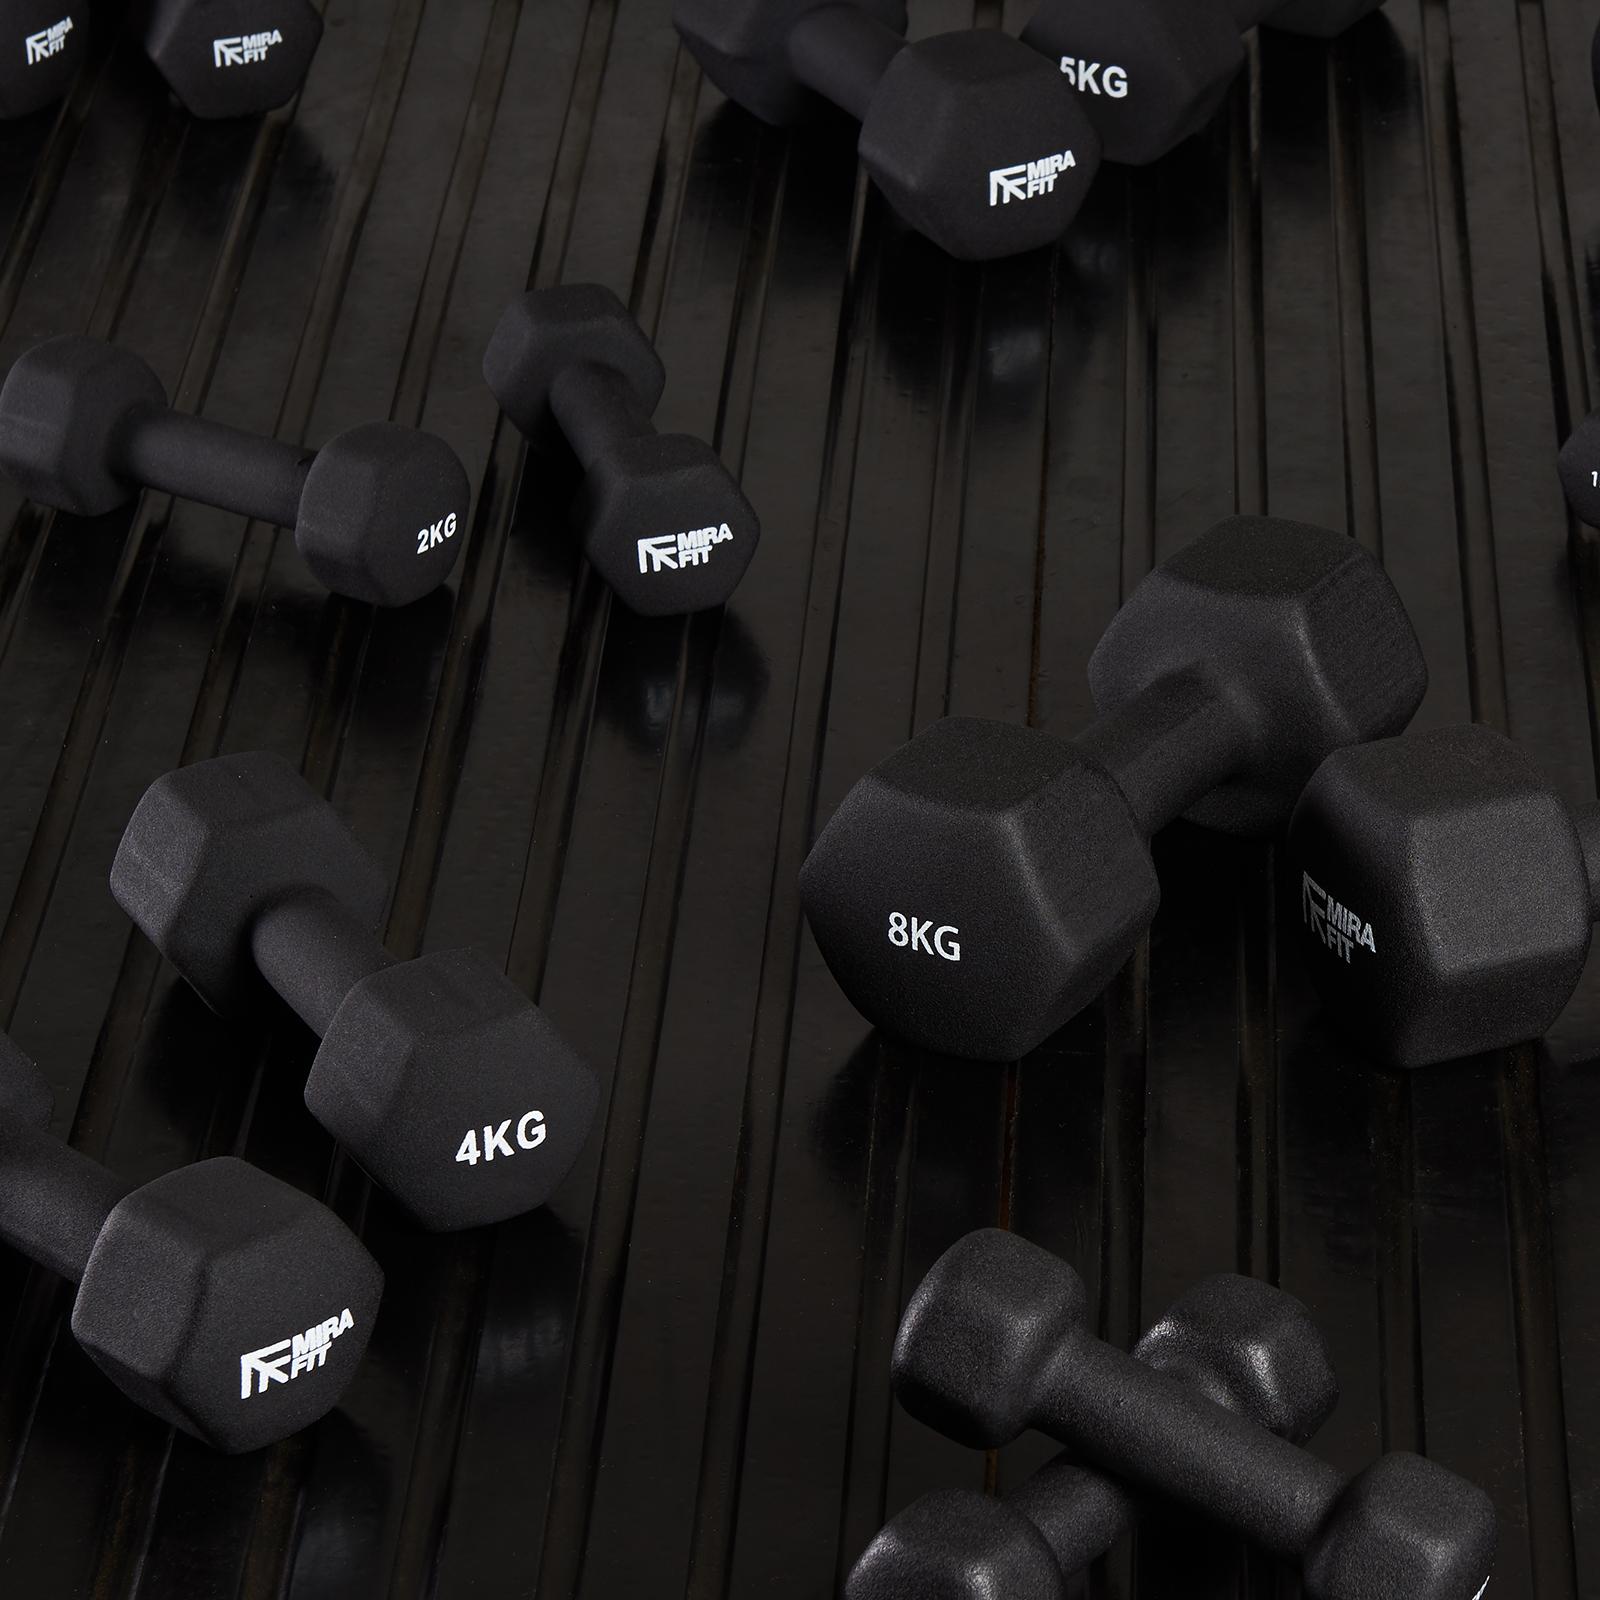 Viper 10 kg Femme Haltère Poids Set Aérobic Gym//Entraînement Haltères Kit